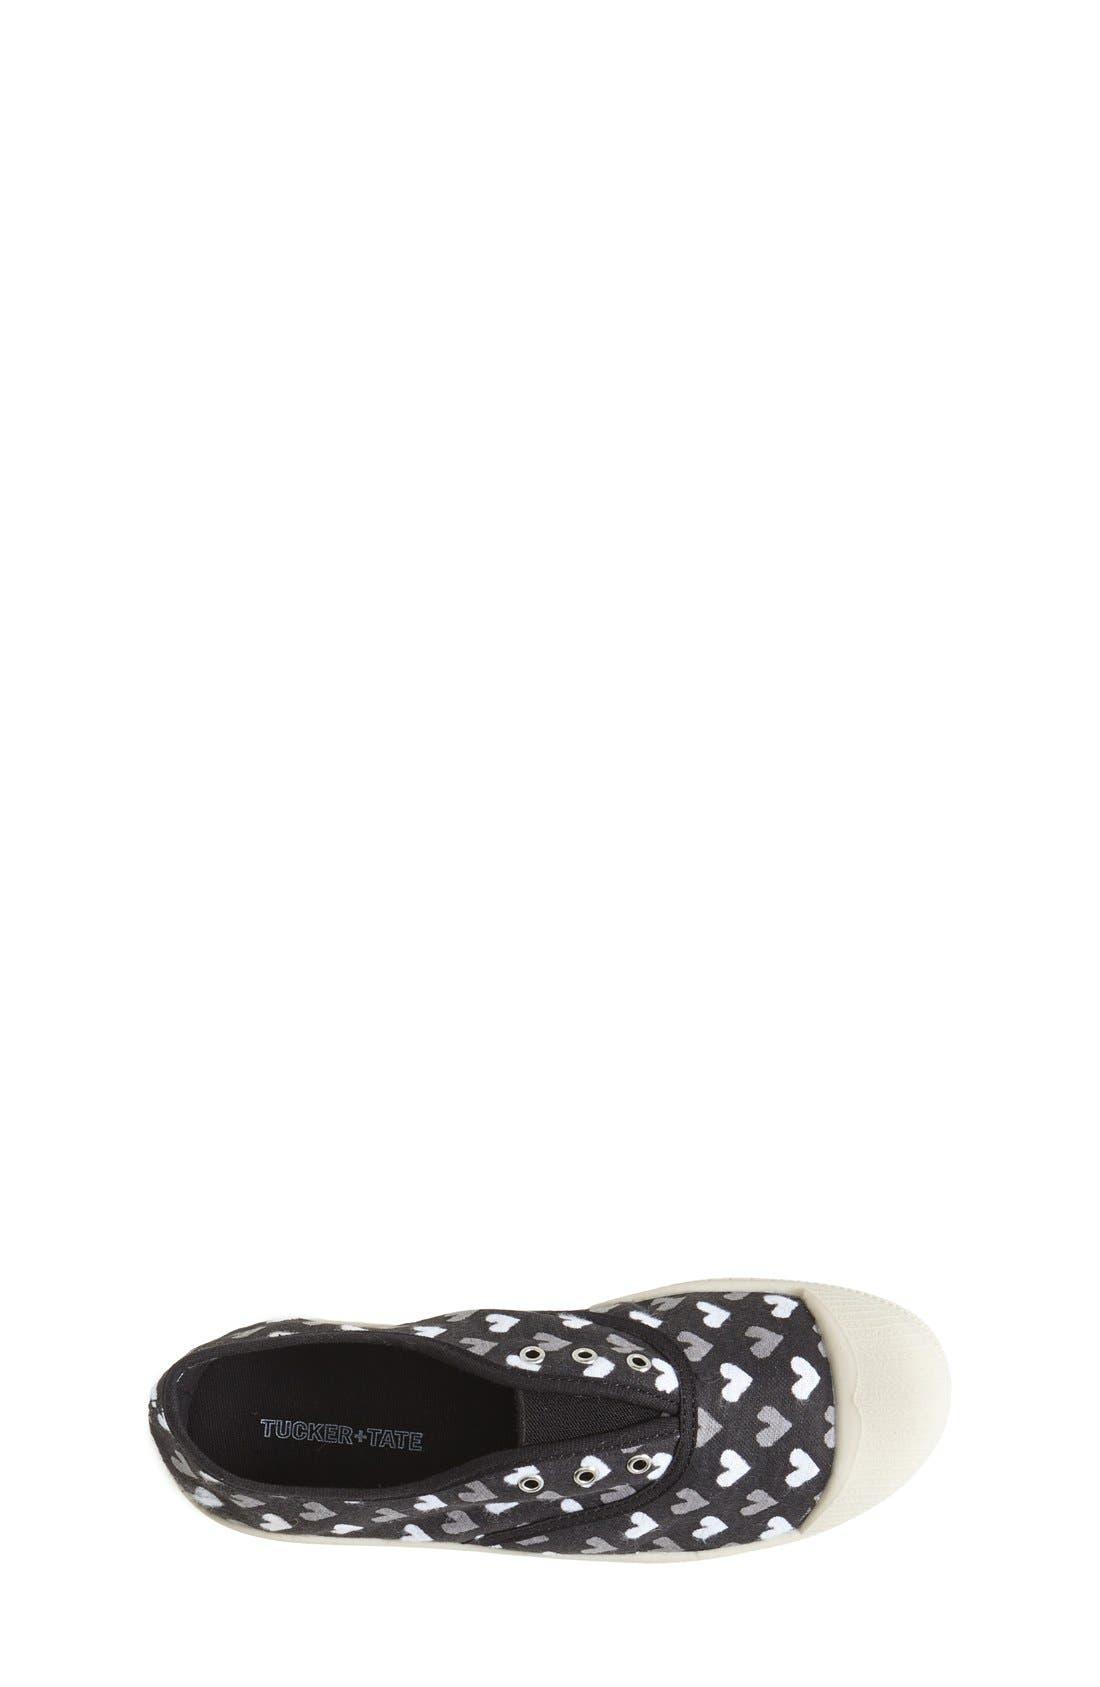 'Marin' Canvas Slip-On Sneaker,                             Alternate thumbnail 3, color,                             001